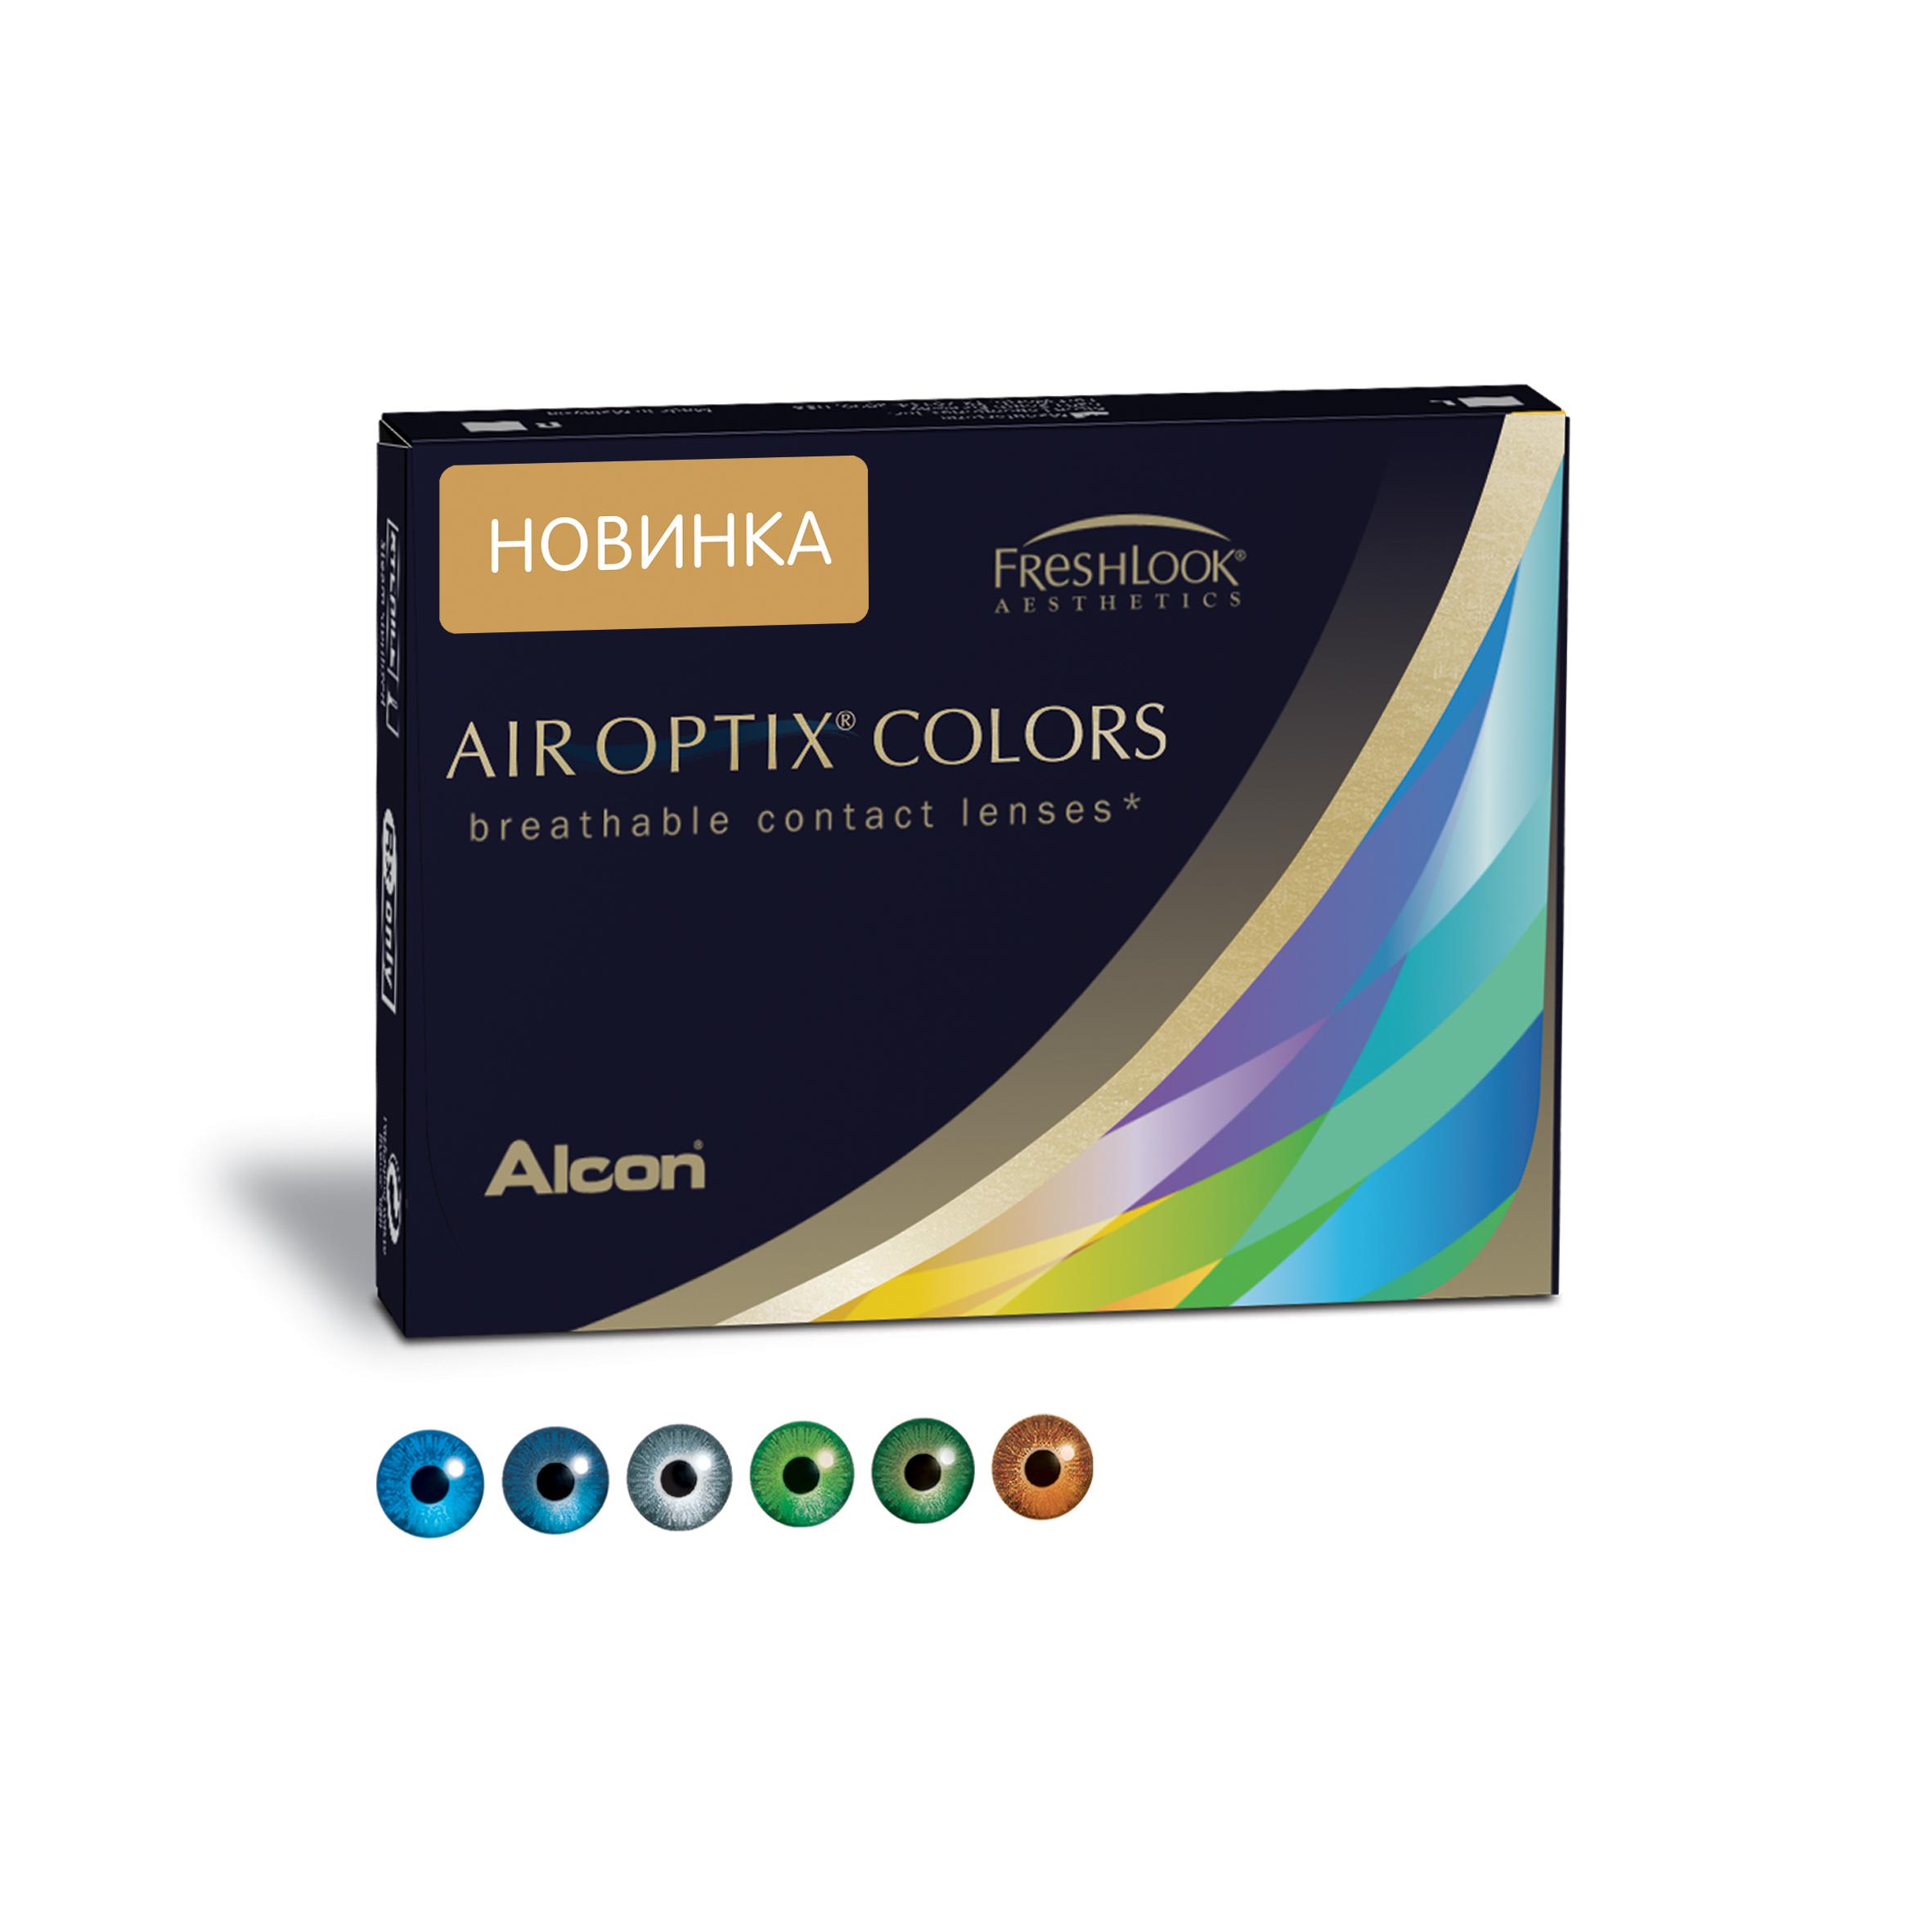 Аlcon контактные линзы Air Optix Colors 2 шт 0.00 Honey31746091Мягкие контактные линзы